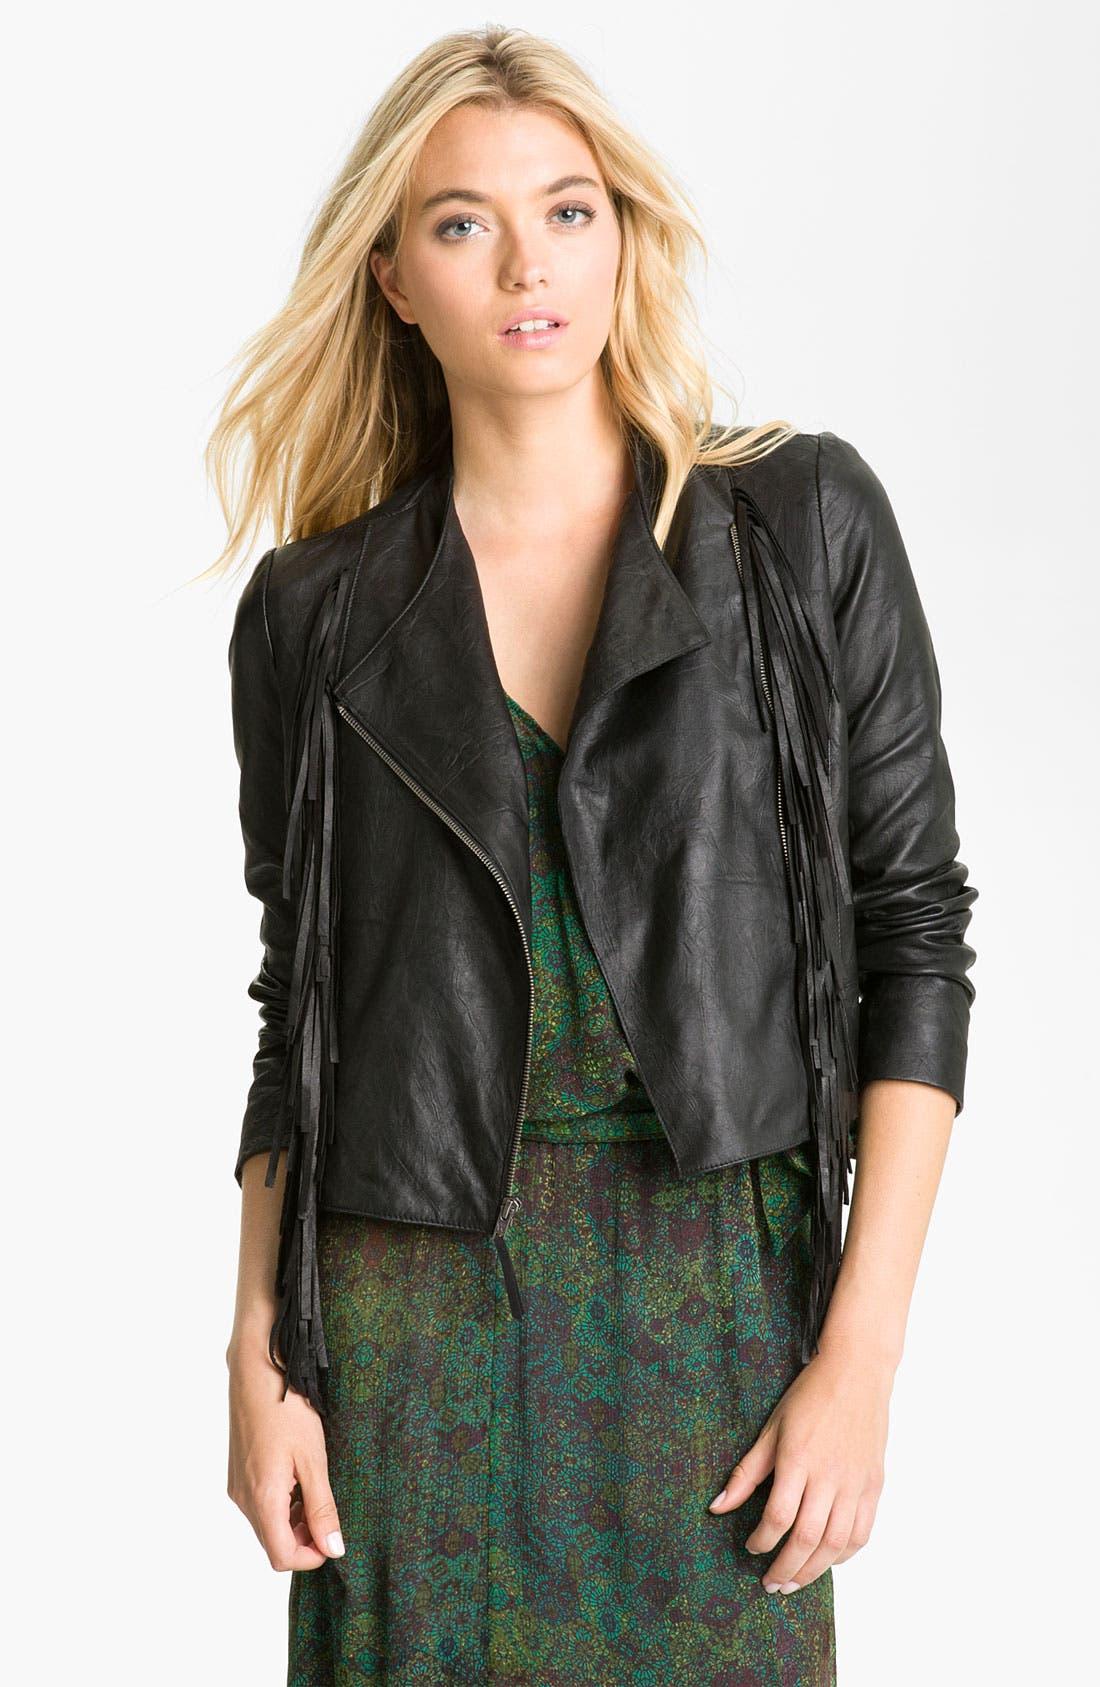 Alternate Image 1 Selected - Ella Moss 'Stevie' Lambskin Leather Jacket